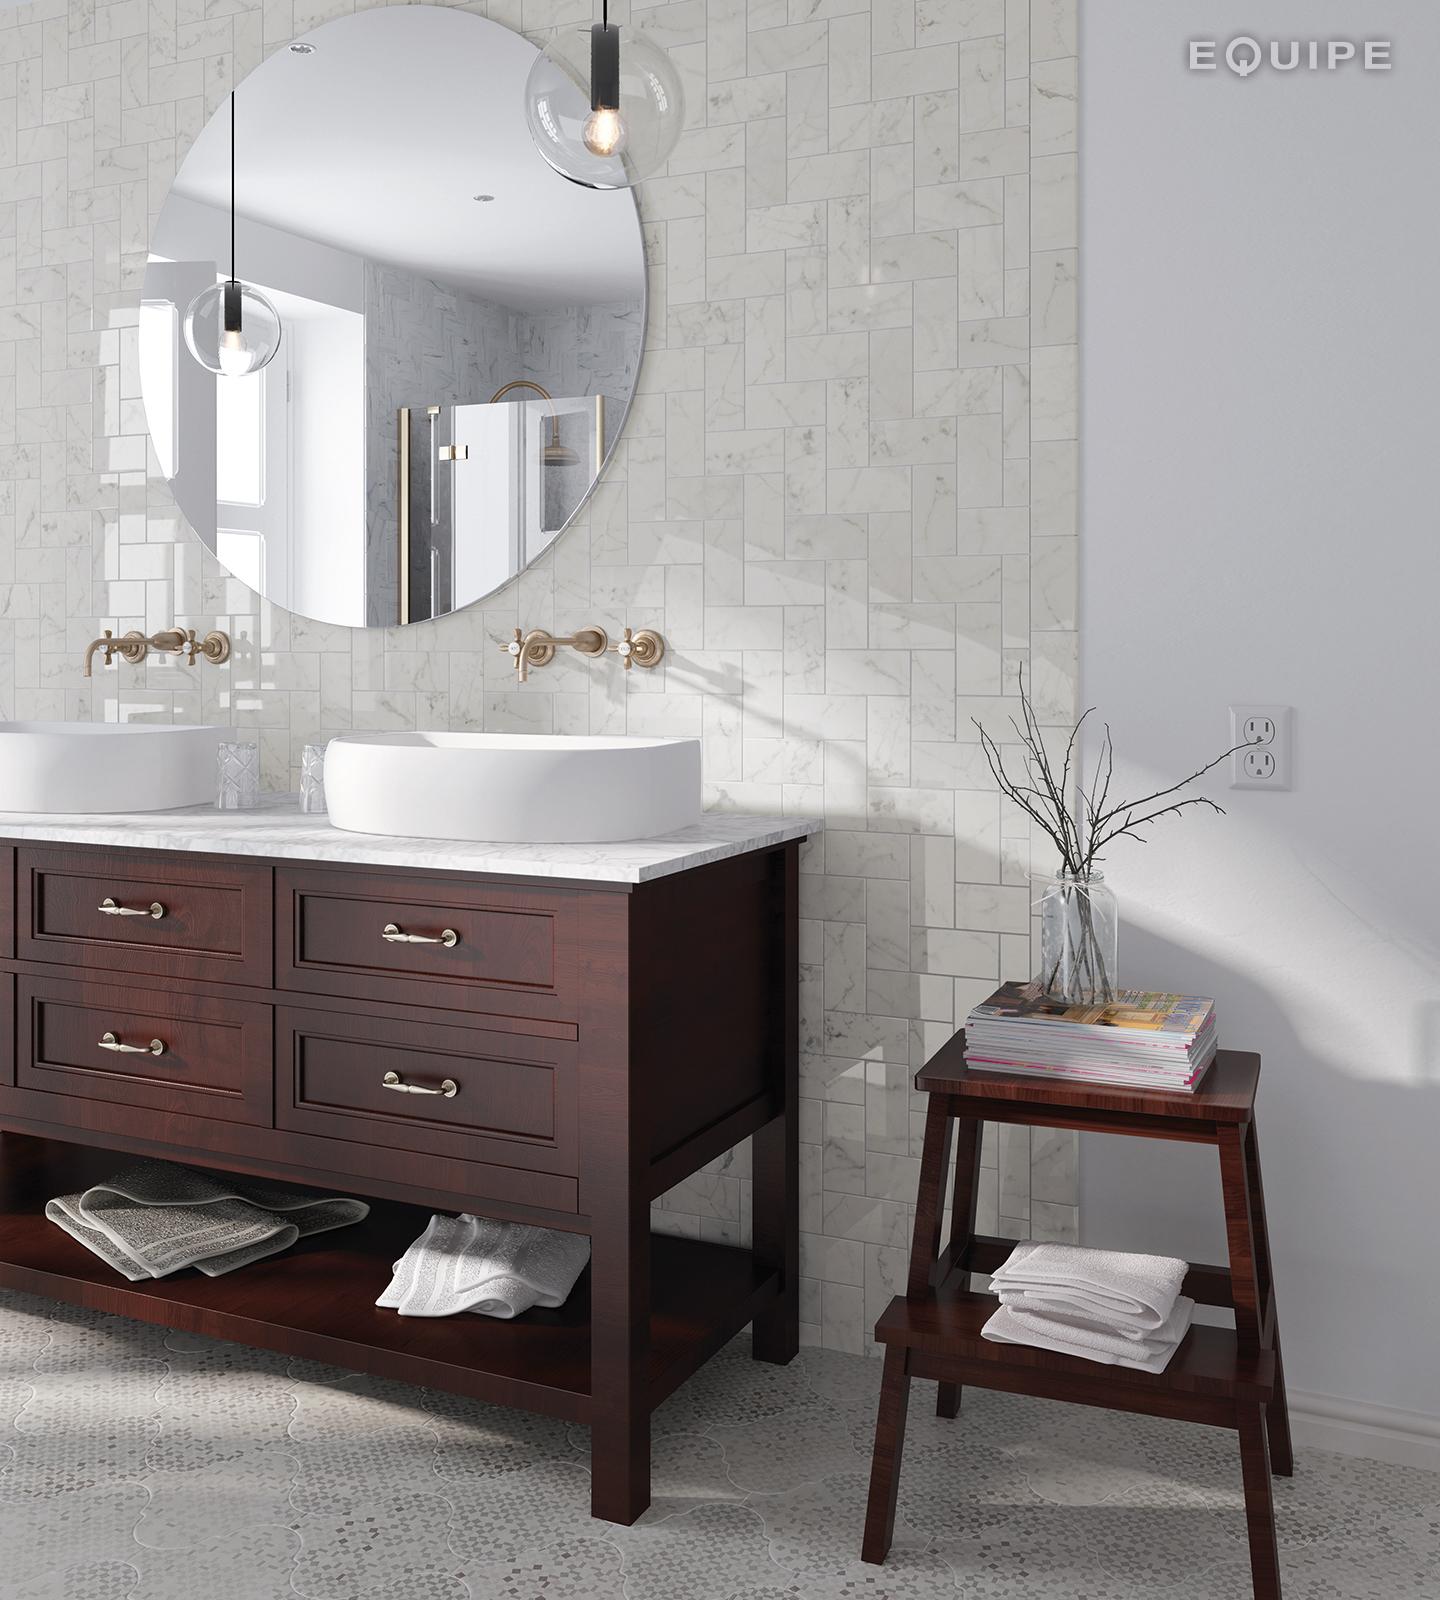 Carrara7,5x15 brillo bath